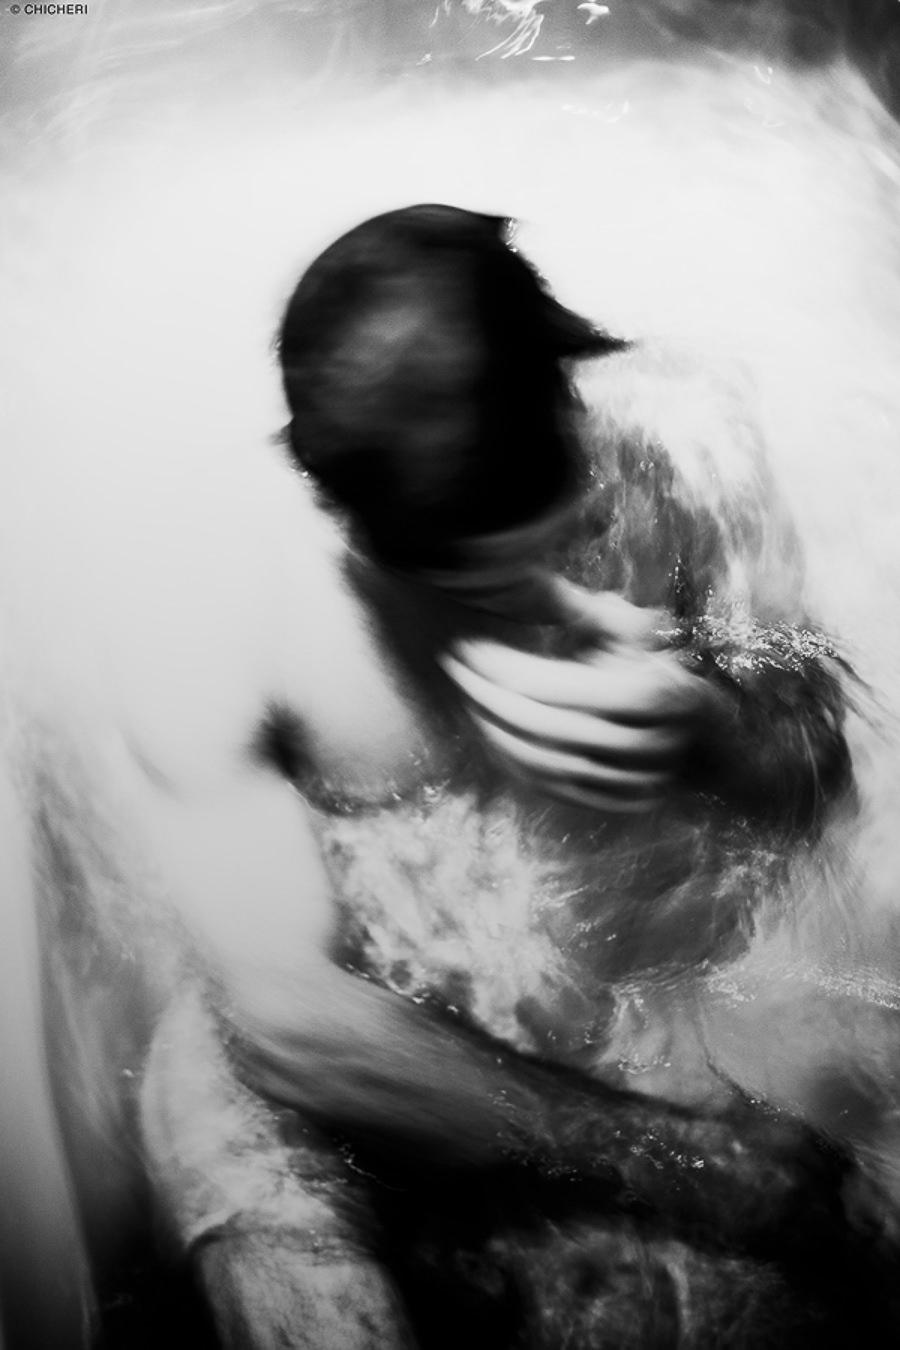 You by Raquel Chicheri